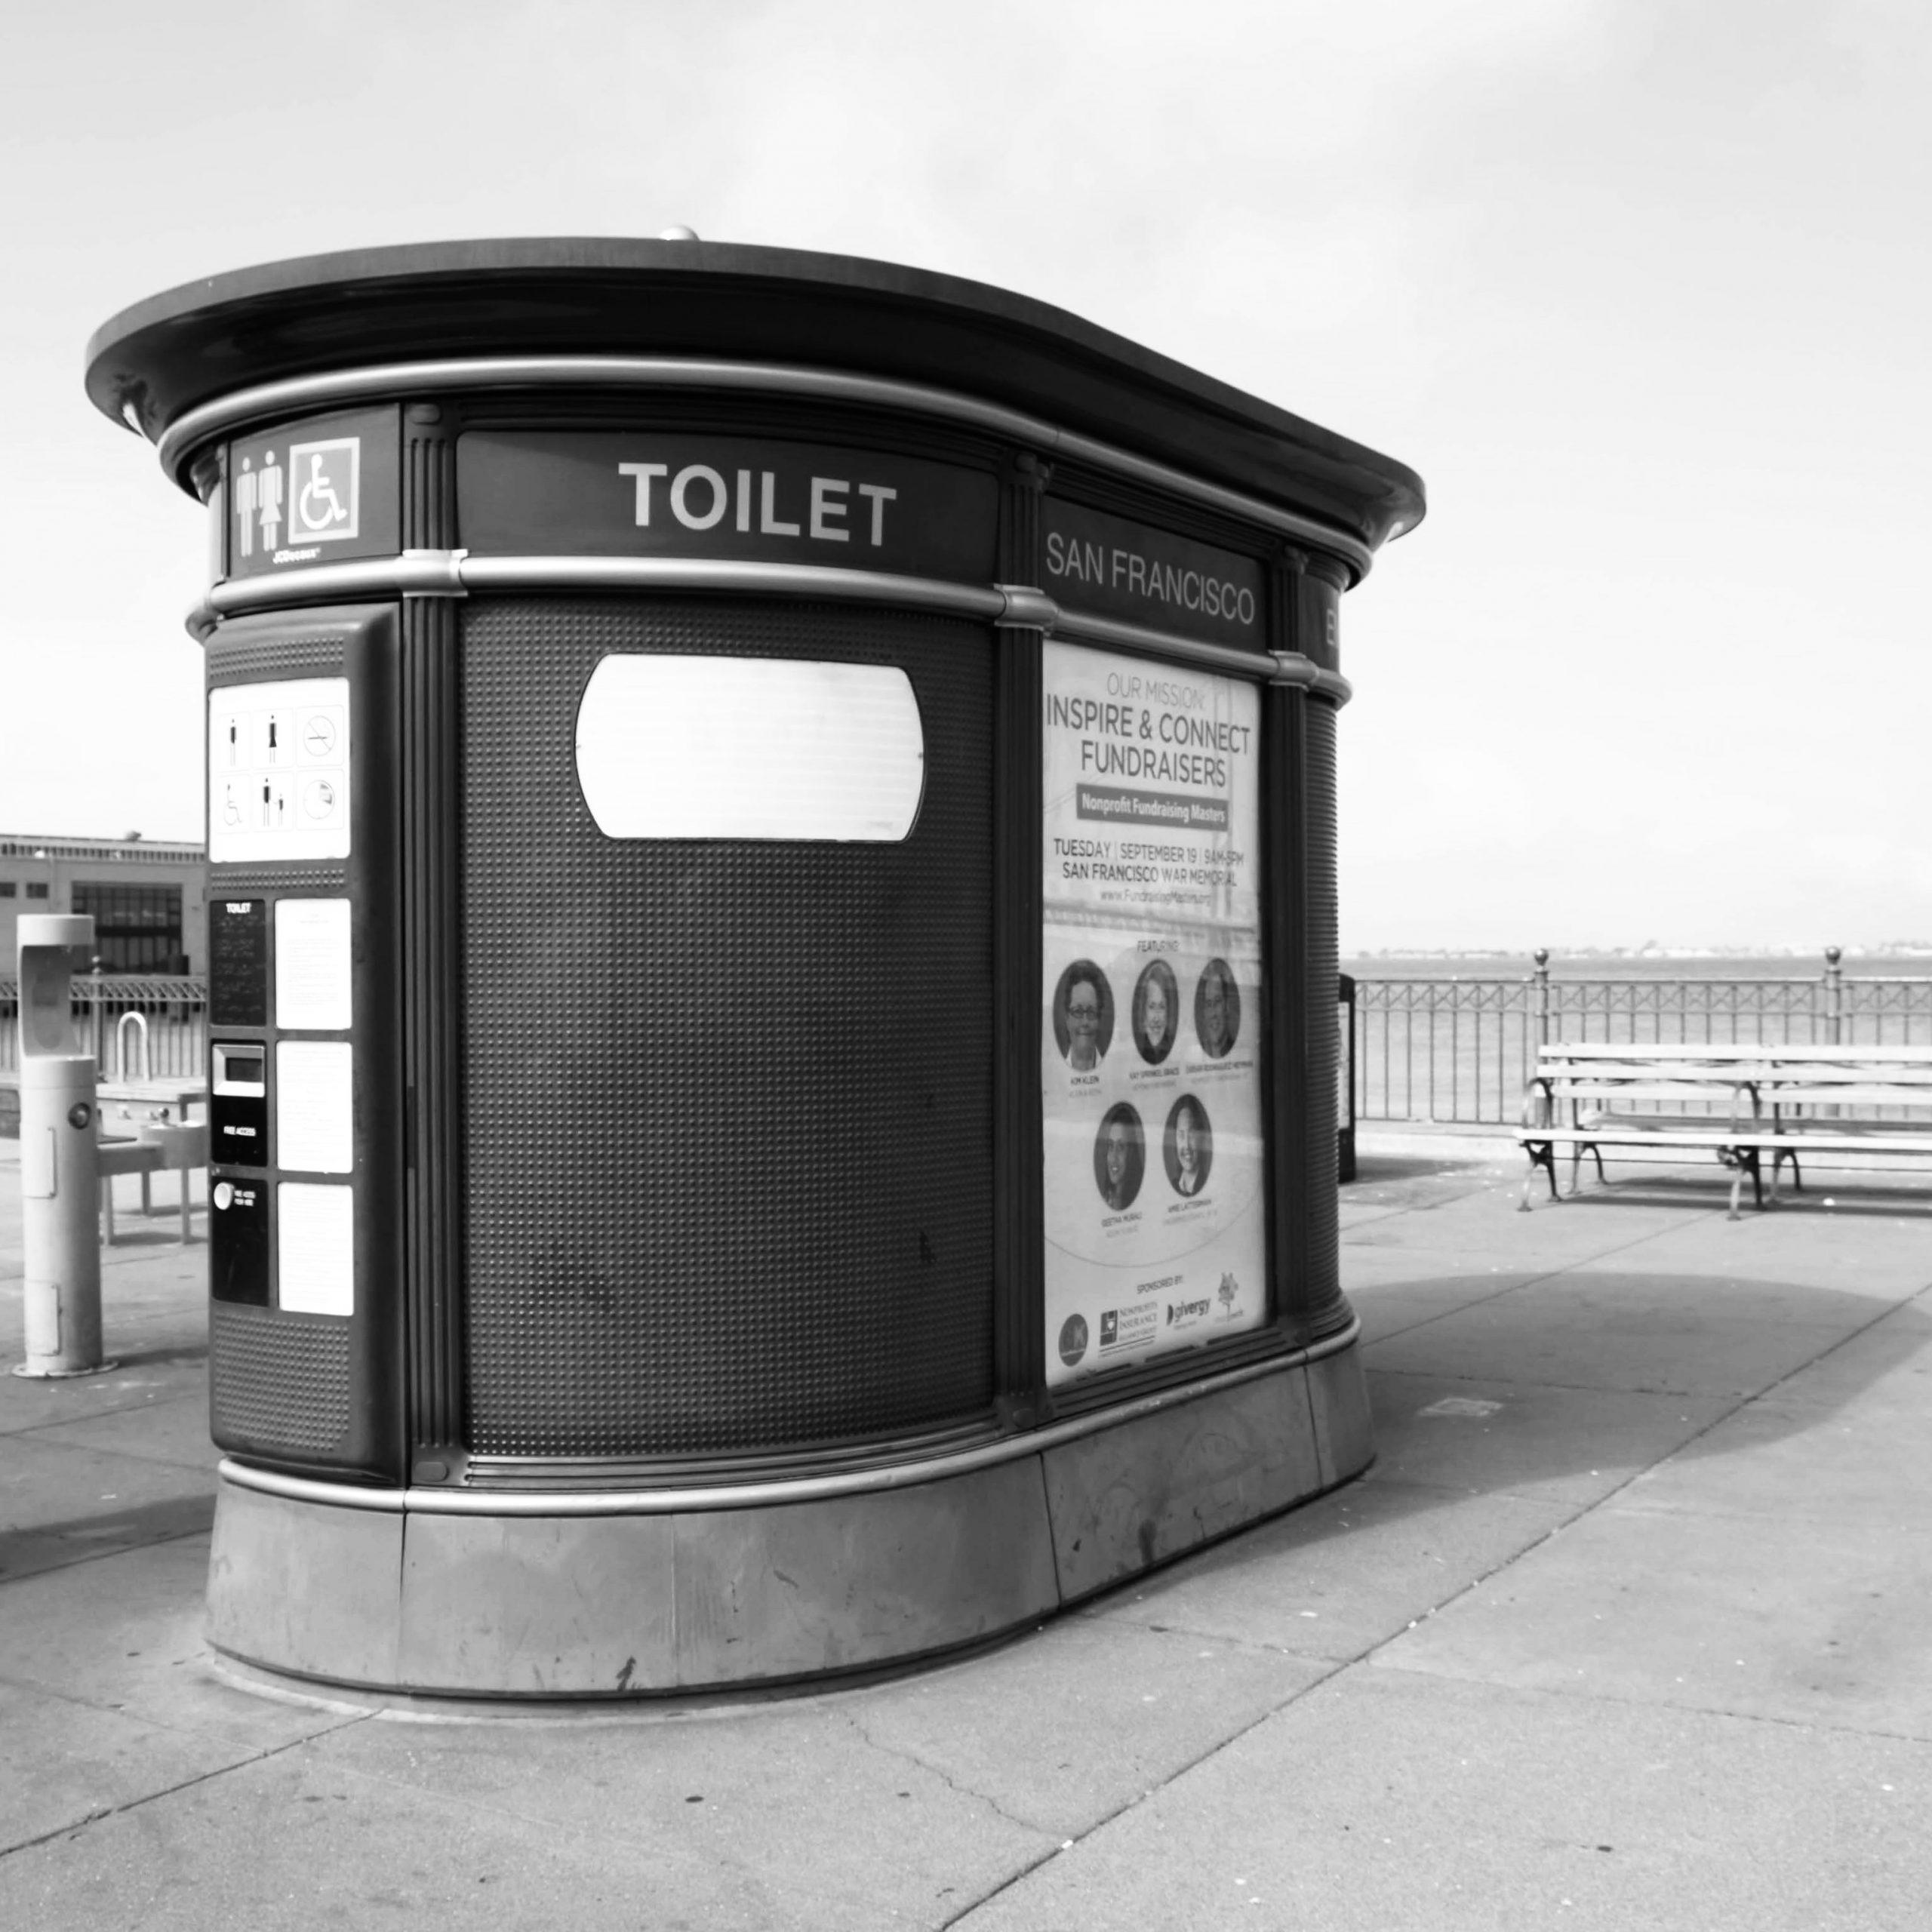 San Francisco JCDecaux Public Toilet